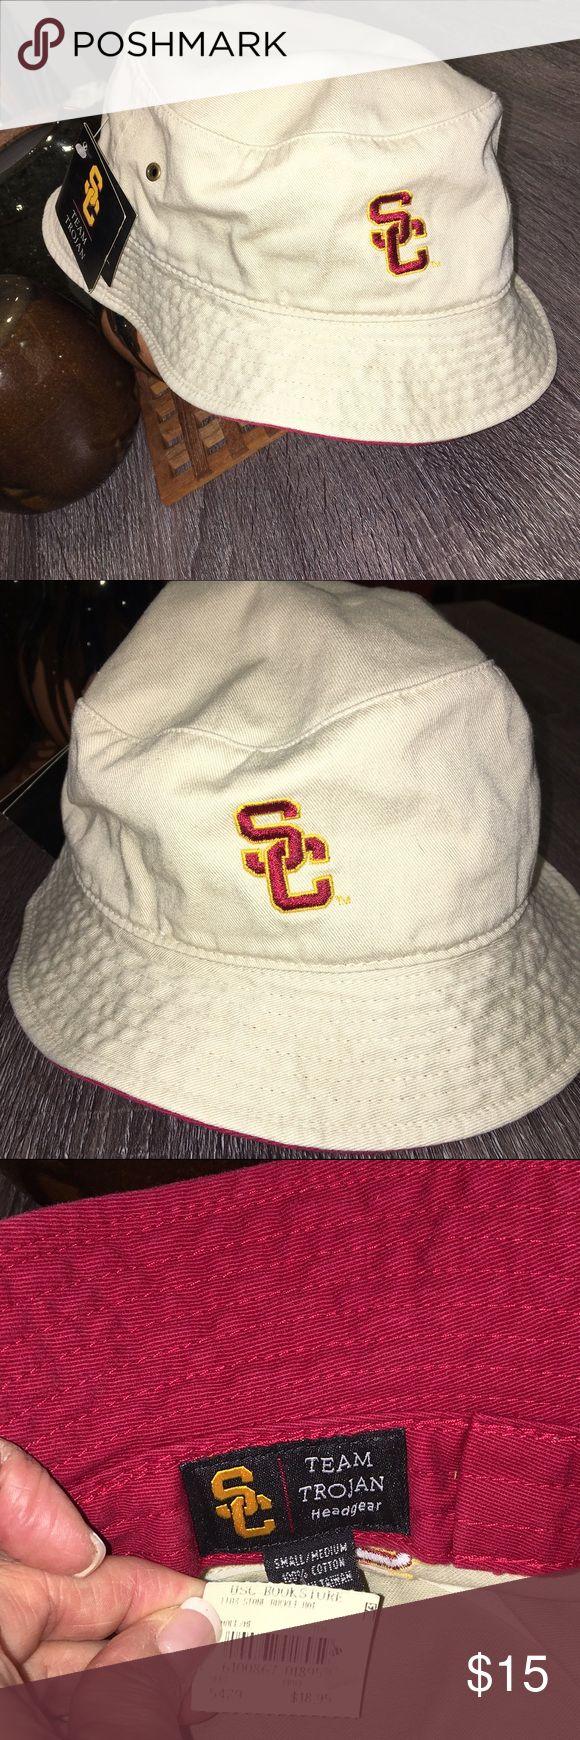 NEW USC bucket hat Cute Team Trojan khaki bucket hat! Red lining inside headband area. 100% cotton. BRAND NEW NEVER WORN, beautiful, crisp and fresh. Fight On!! USC Accessories Hats